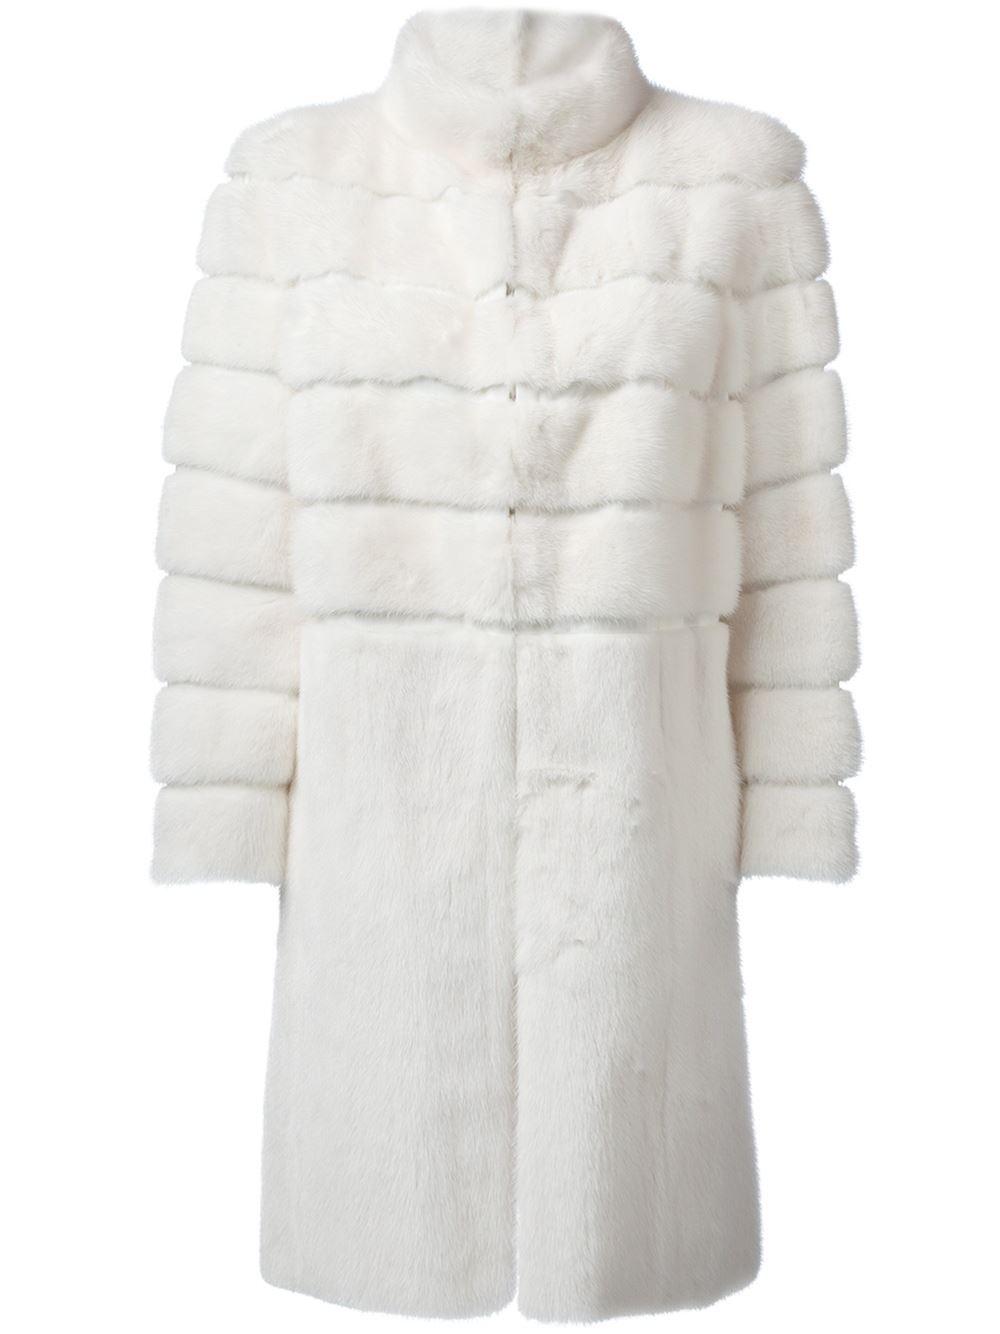 Lyst - Fendi Fur Coat in White